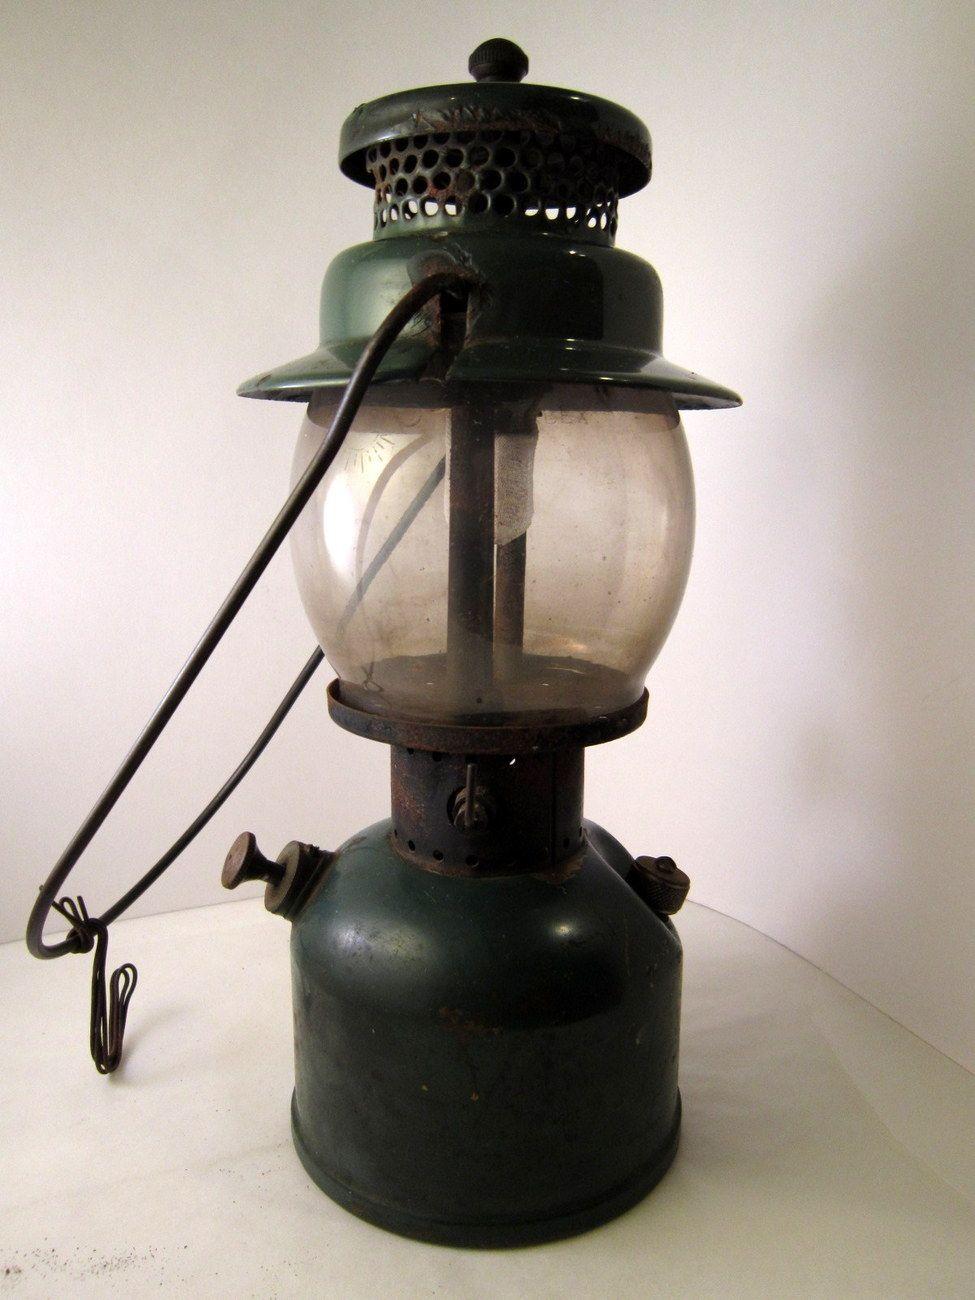 1945 Coleman Lantern Model 242C Green Single Mantle Liquid